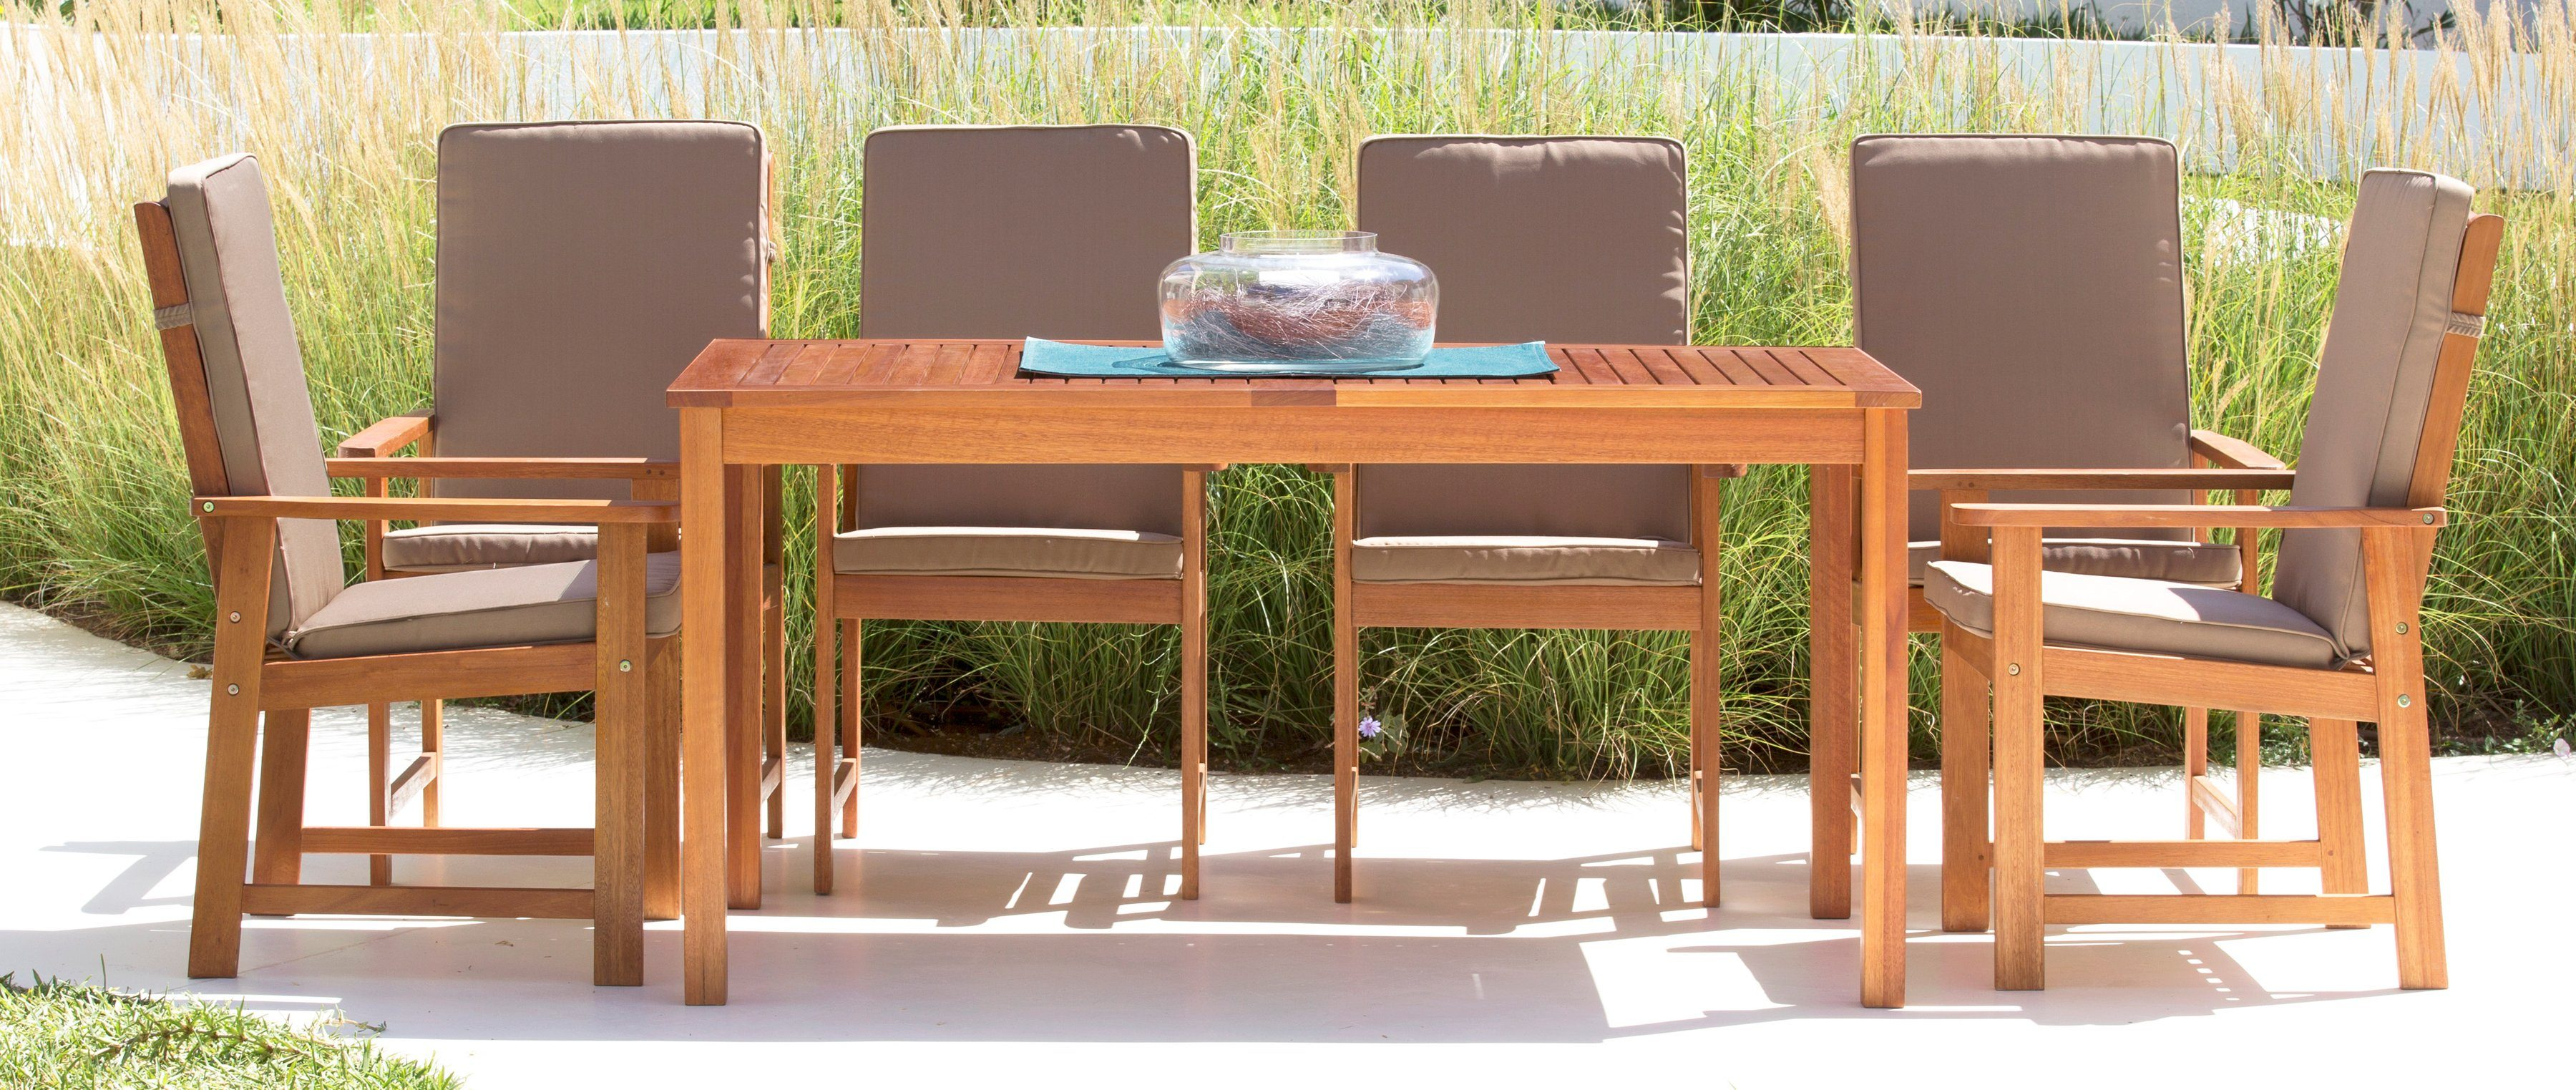 Gartenmöbelset »Vancouver«, 13-tlg., 6 Sessel, Tisch 150x80 cm, Eukalyptusholz, braun